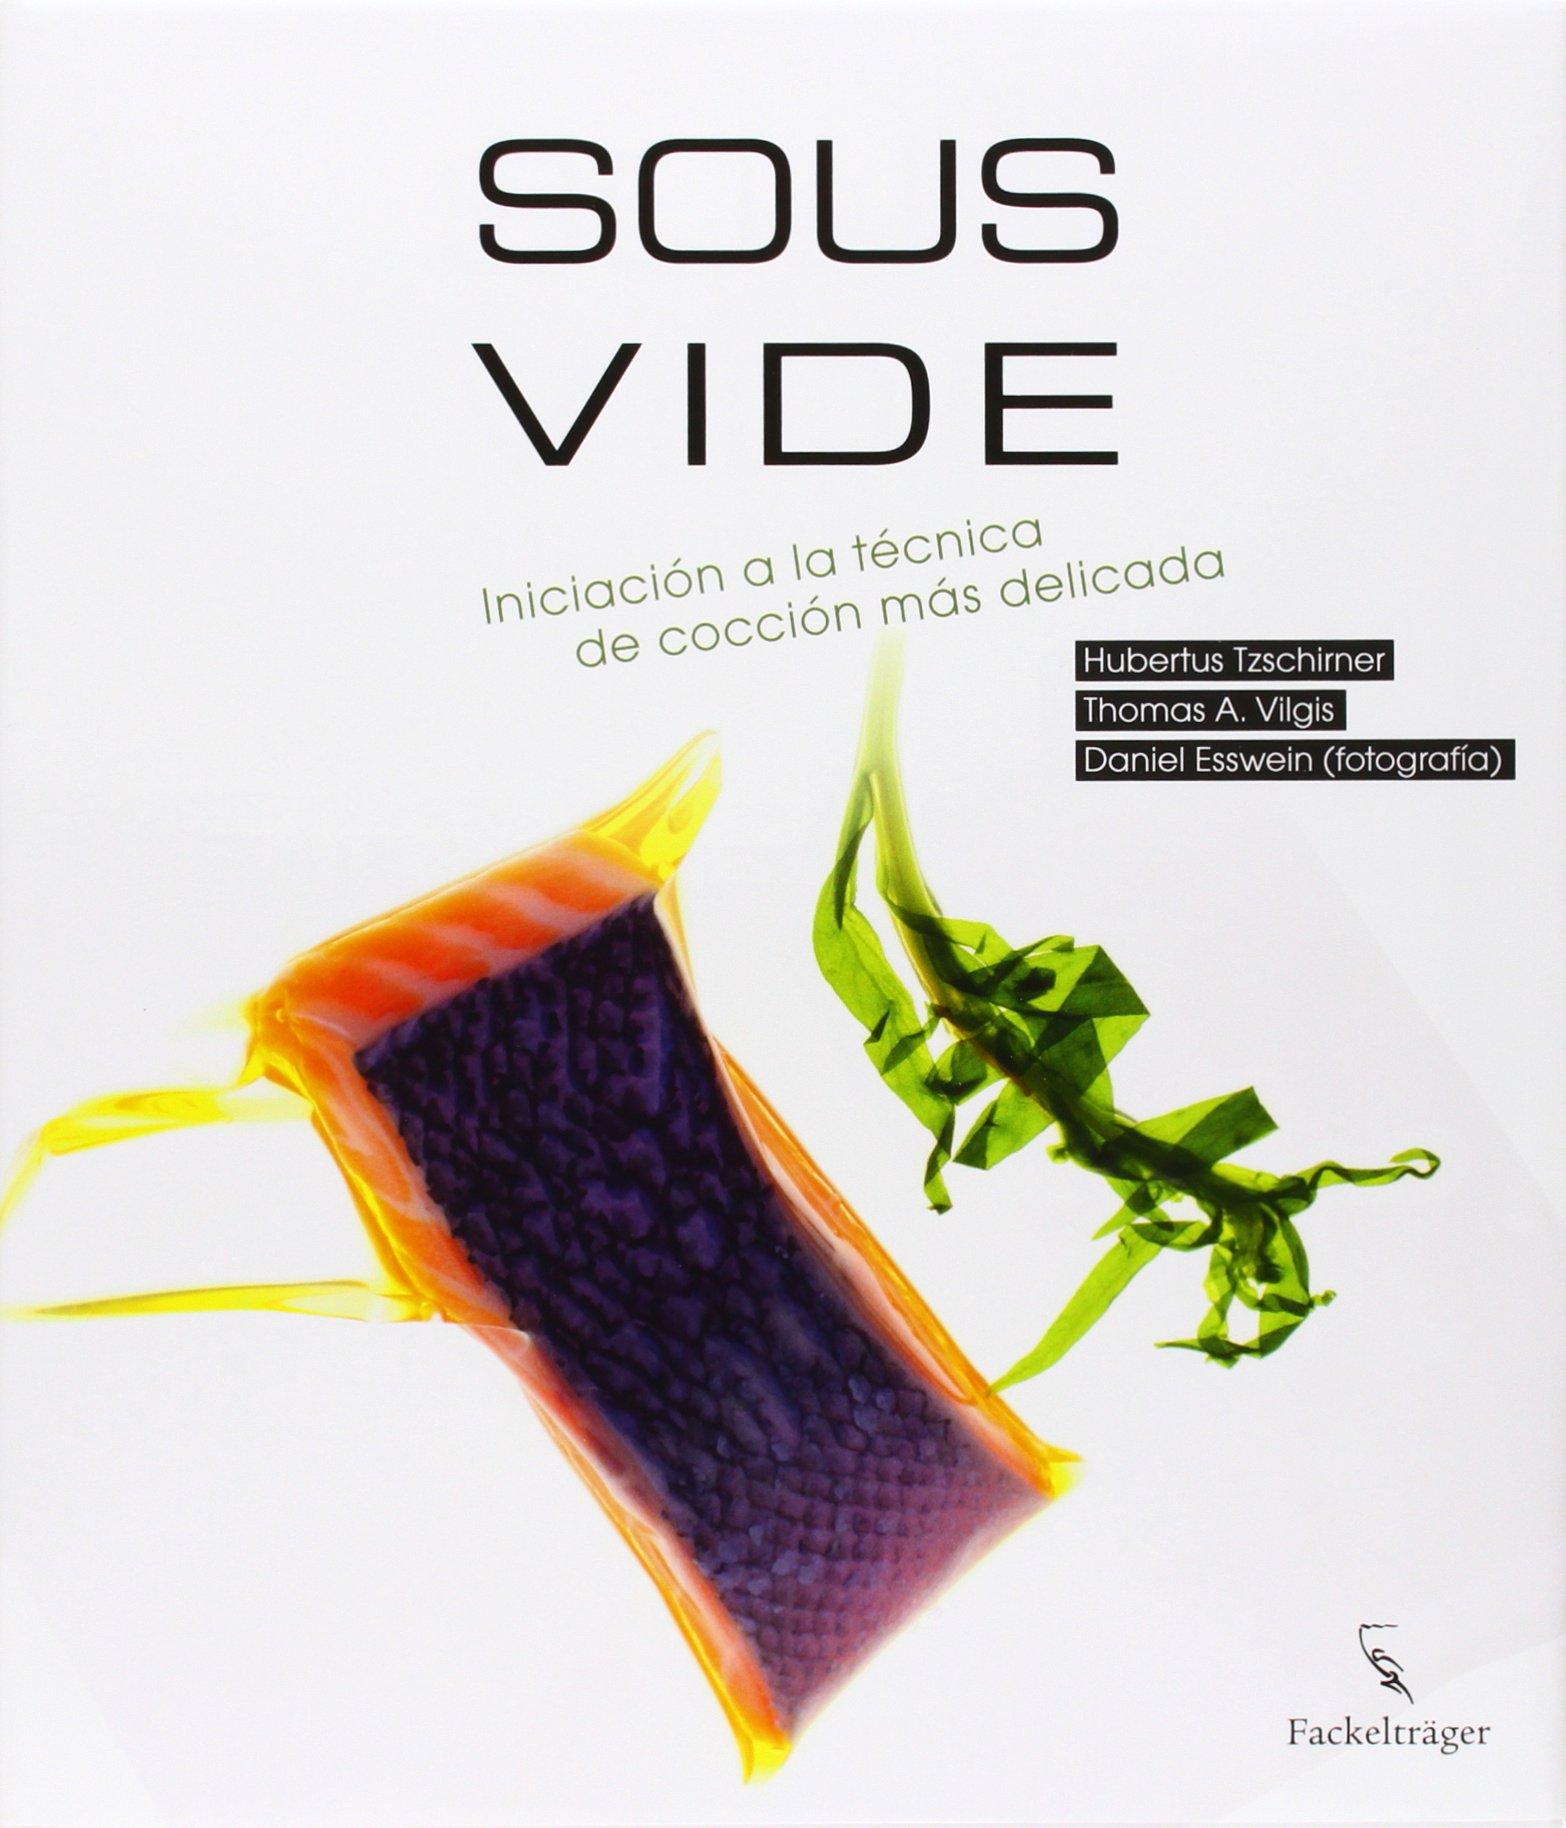 Sous Vide: Amazon.es: Tzschirner, Hubertus, Vilgis, Thomas A., Esswein, Daniel: Libros